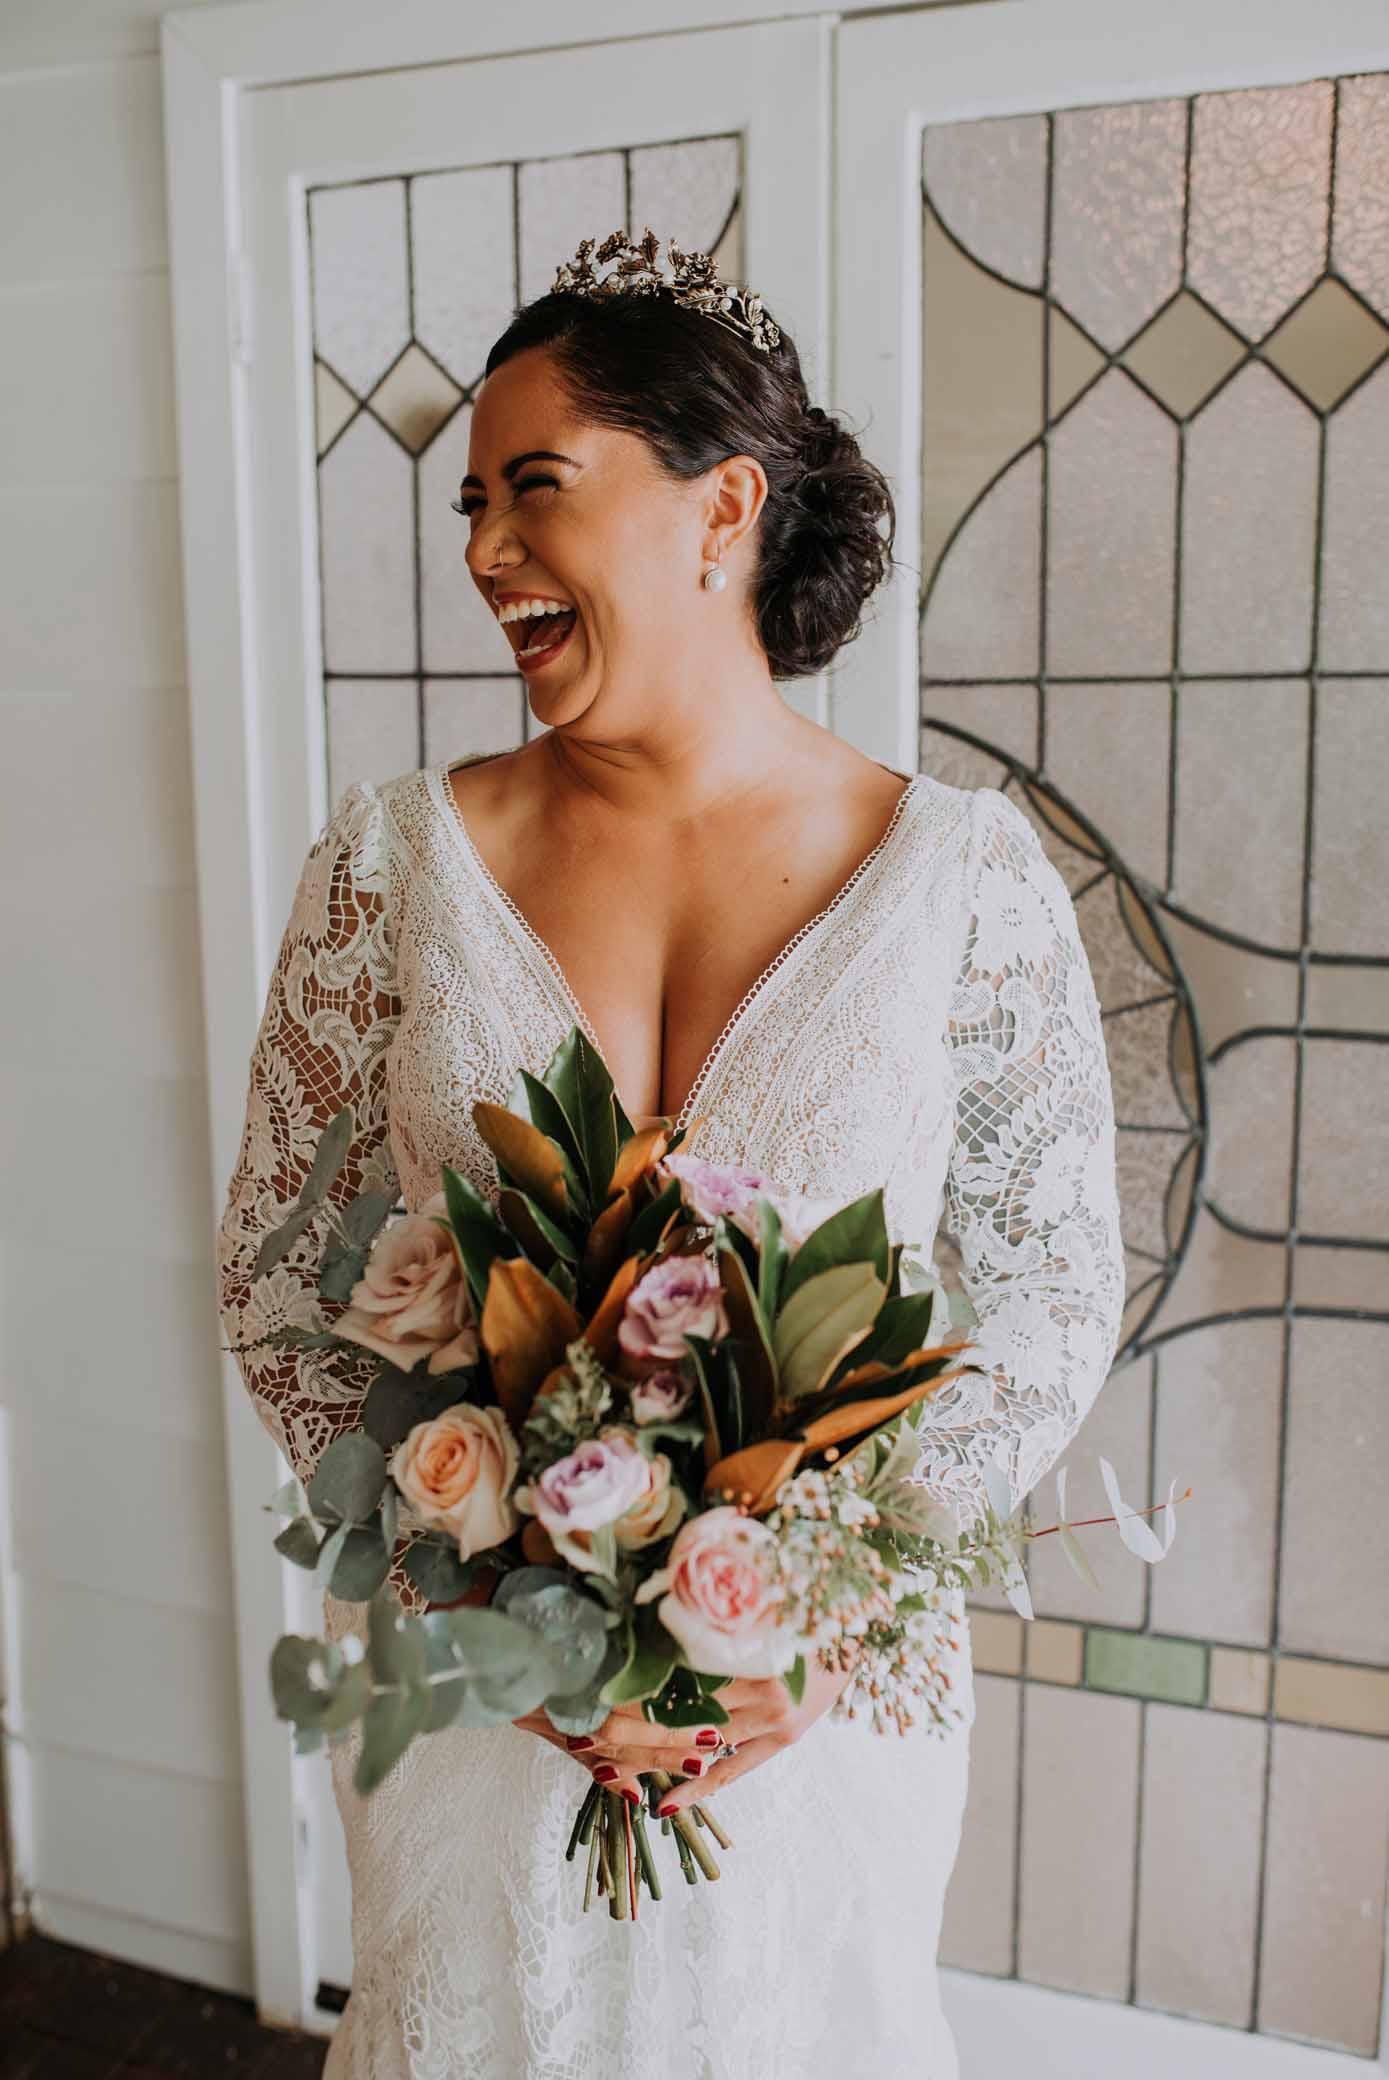 Dani Drury Photographer lesbian same-sex couple gay marriage Queenland Australia COVID 19 Australian wedding Dancing With Her print magazine